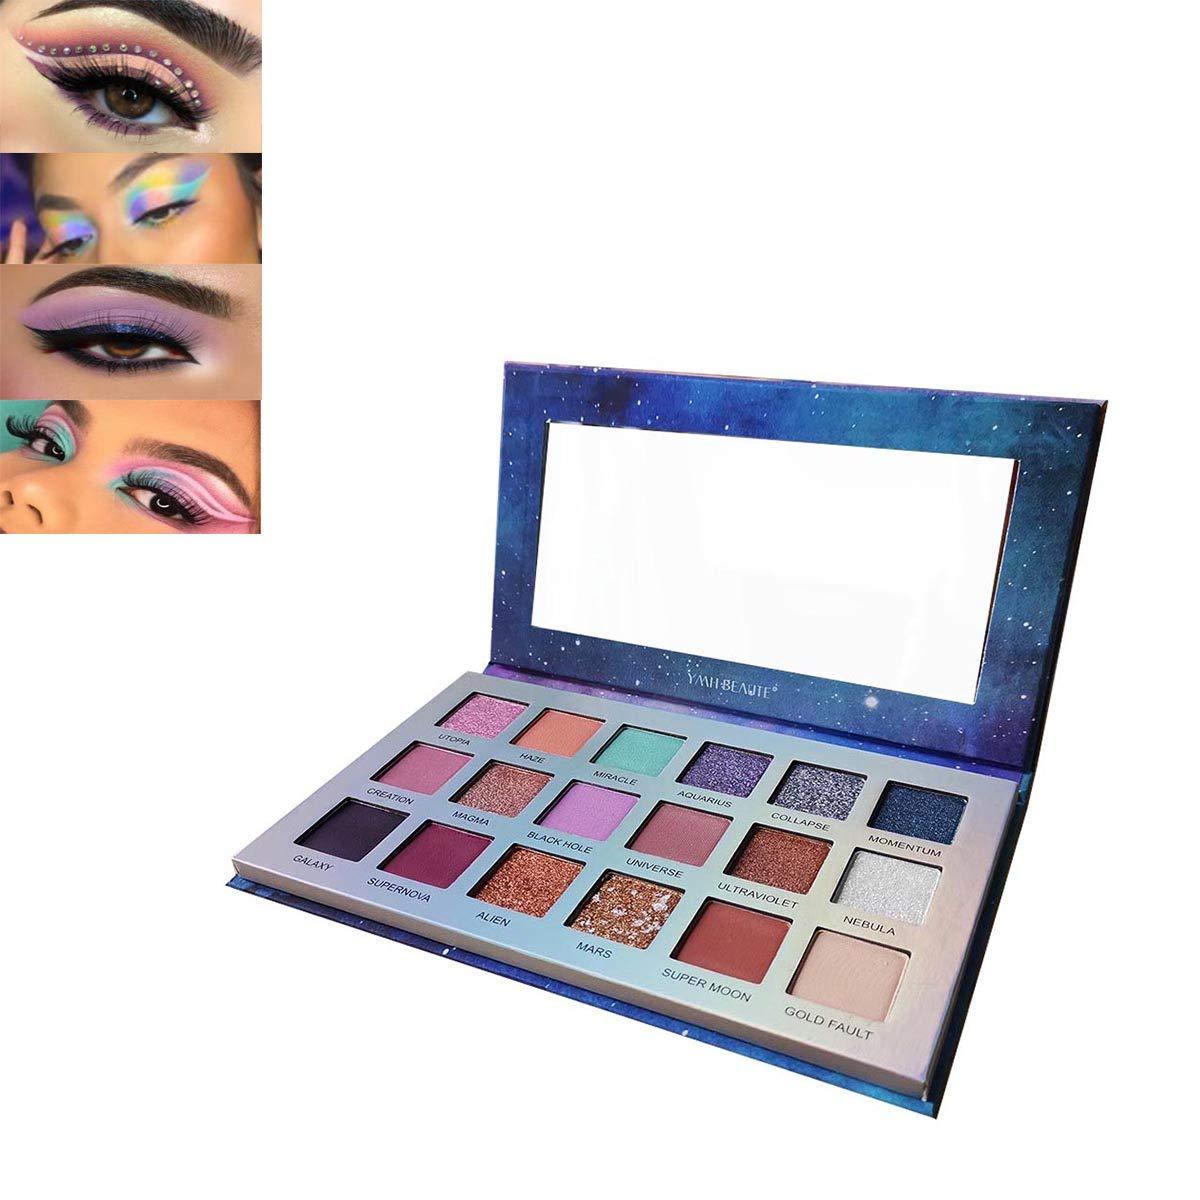 18 Colors Glitter Eyeshadow Palette, YMH BEAUTE Shimmer Matte Eyeshadow Makeup Palette Pigmented Natural Eye Shadows Long Lasting Waterproof Colorful Eyeshadow Pallet (GAIA)